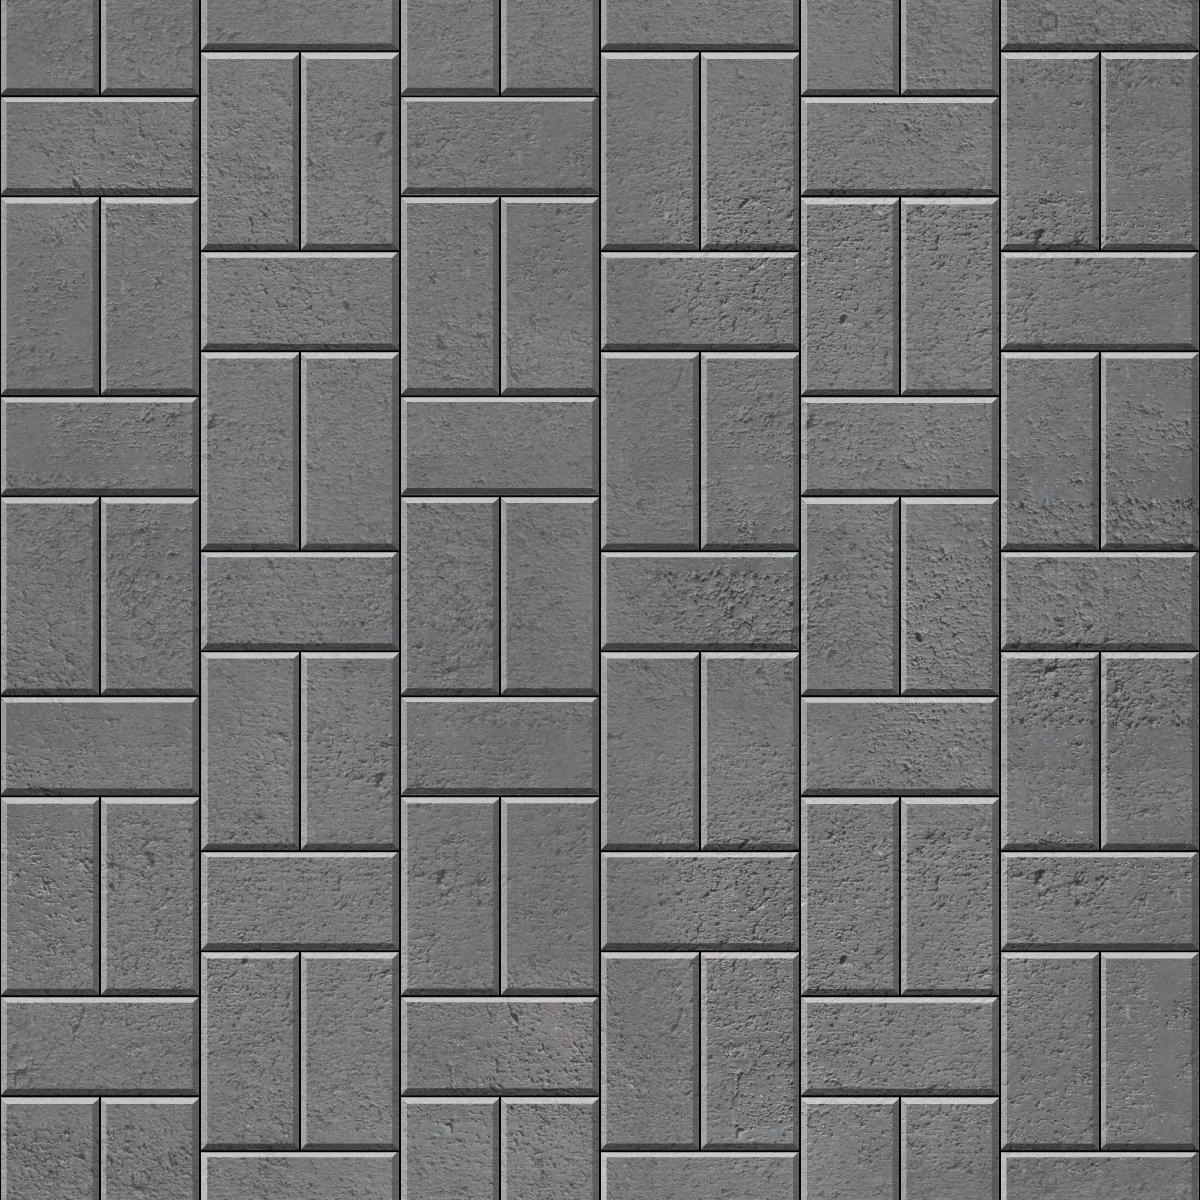 Single Basketweave Offset brick paver